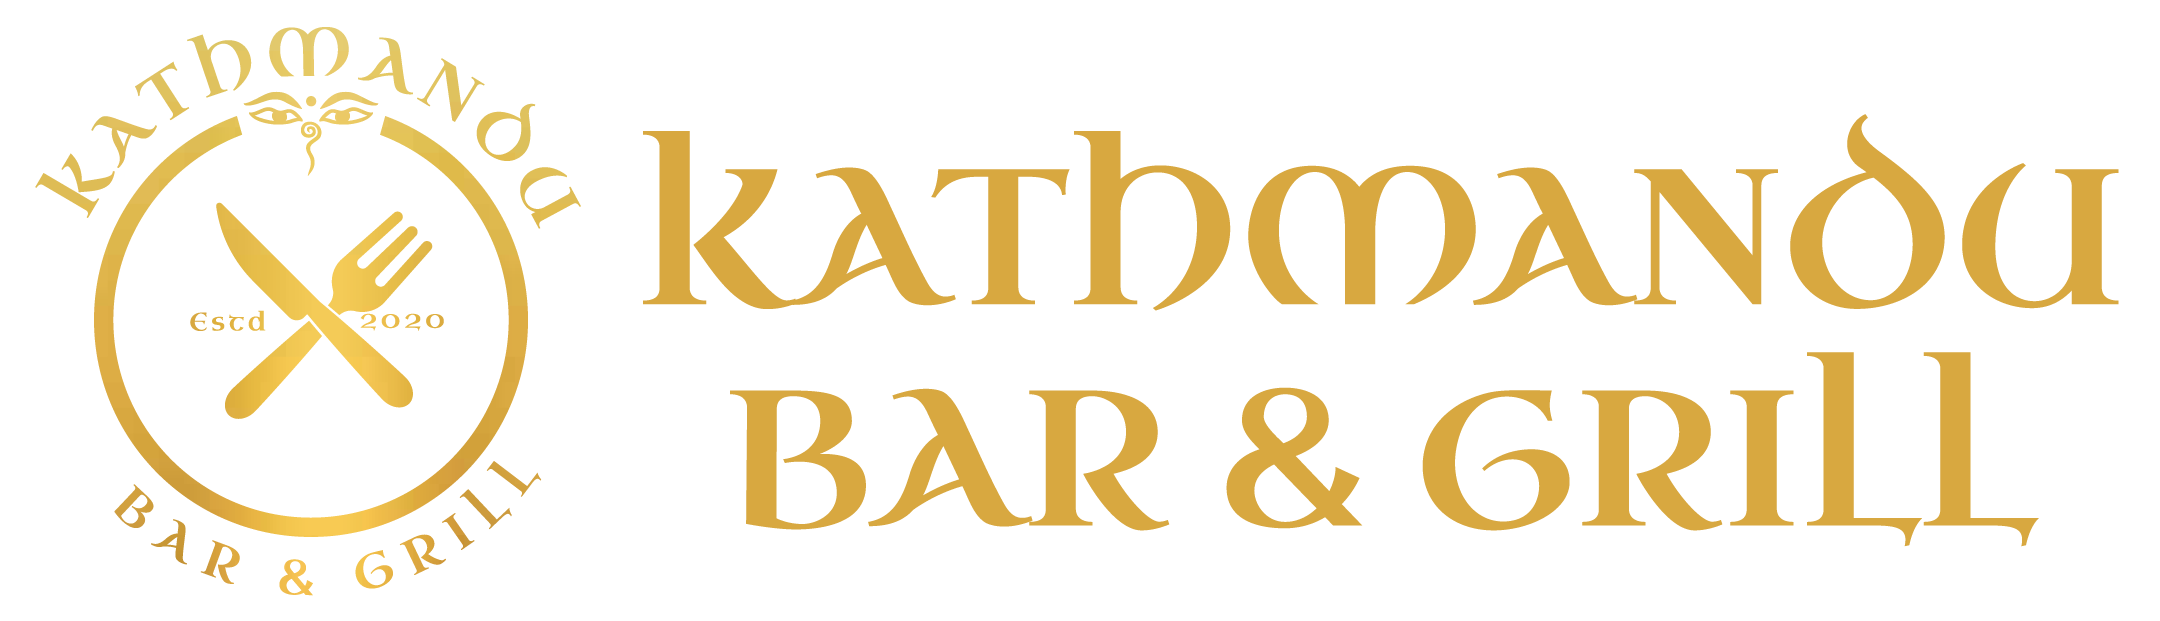 Kathmandu Bar & Grill